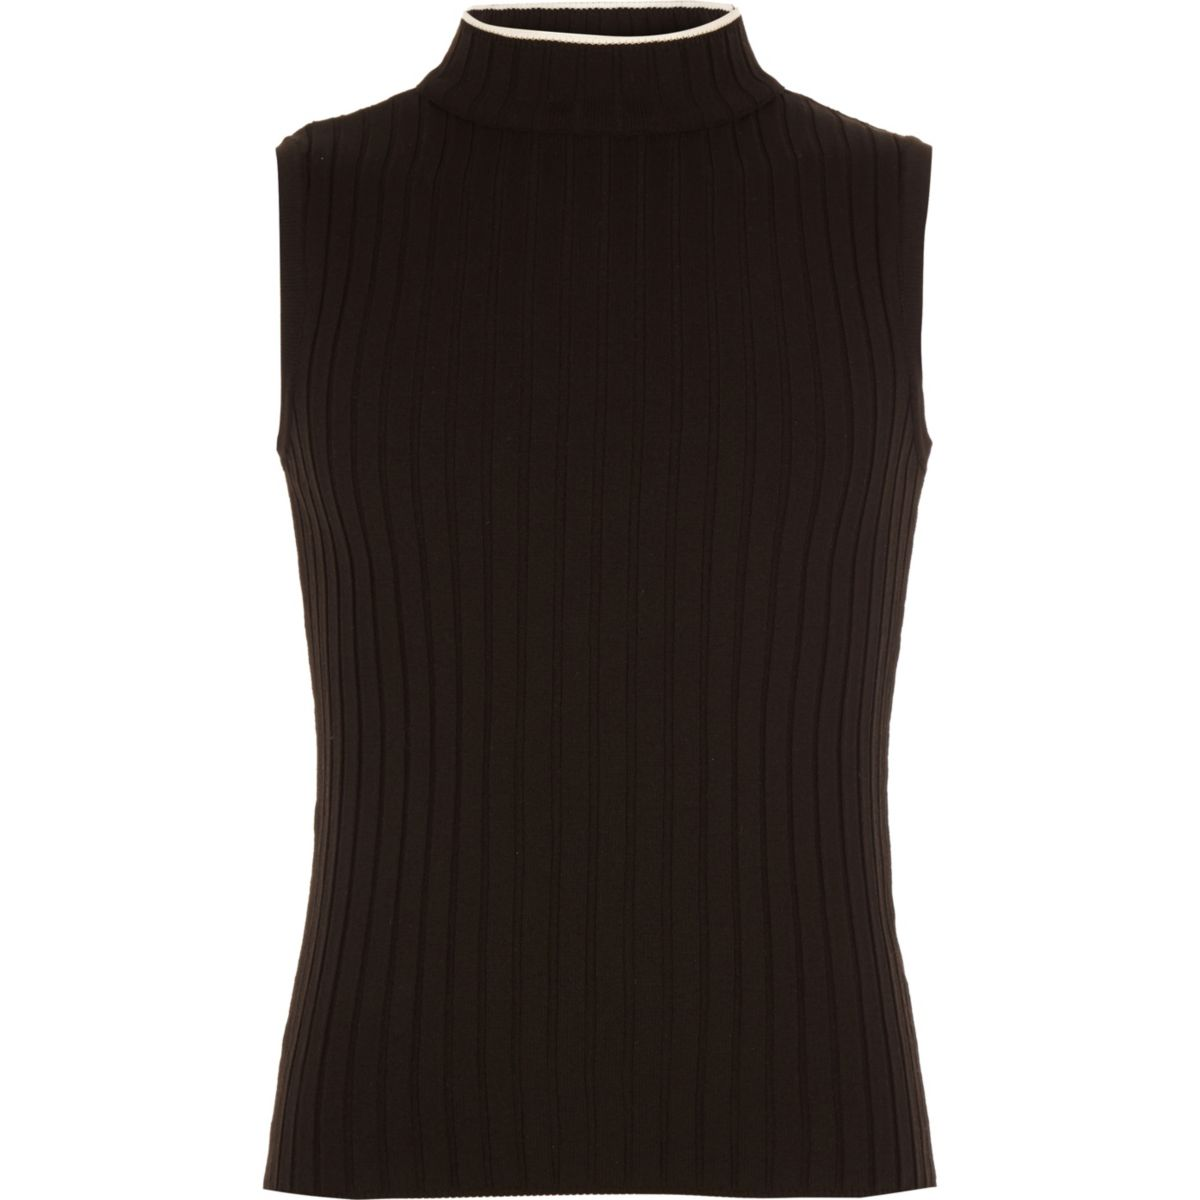 Girls black rib tank top